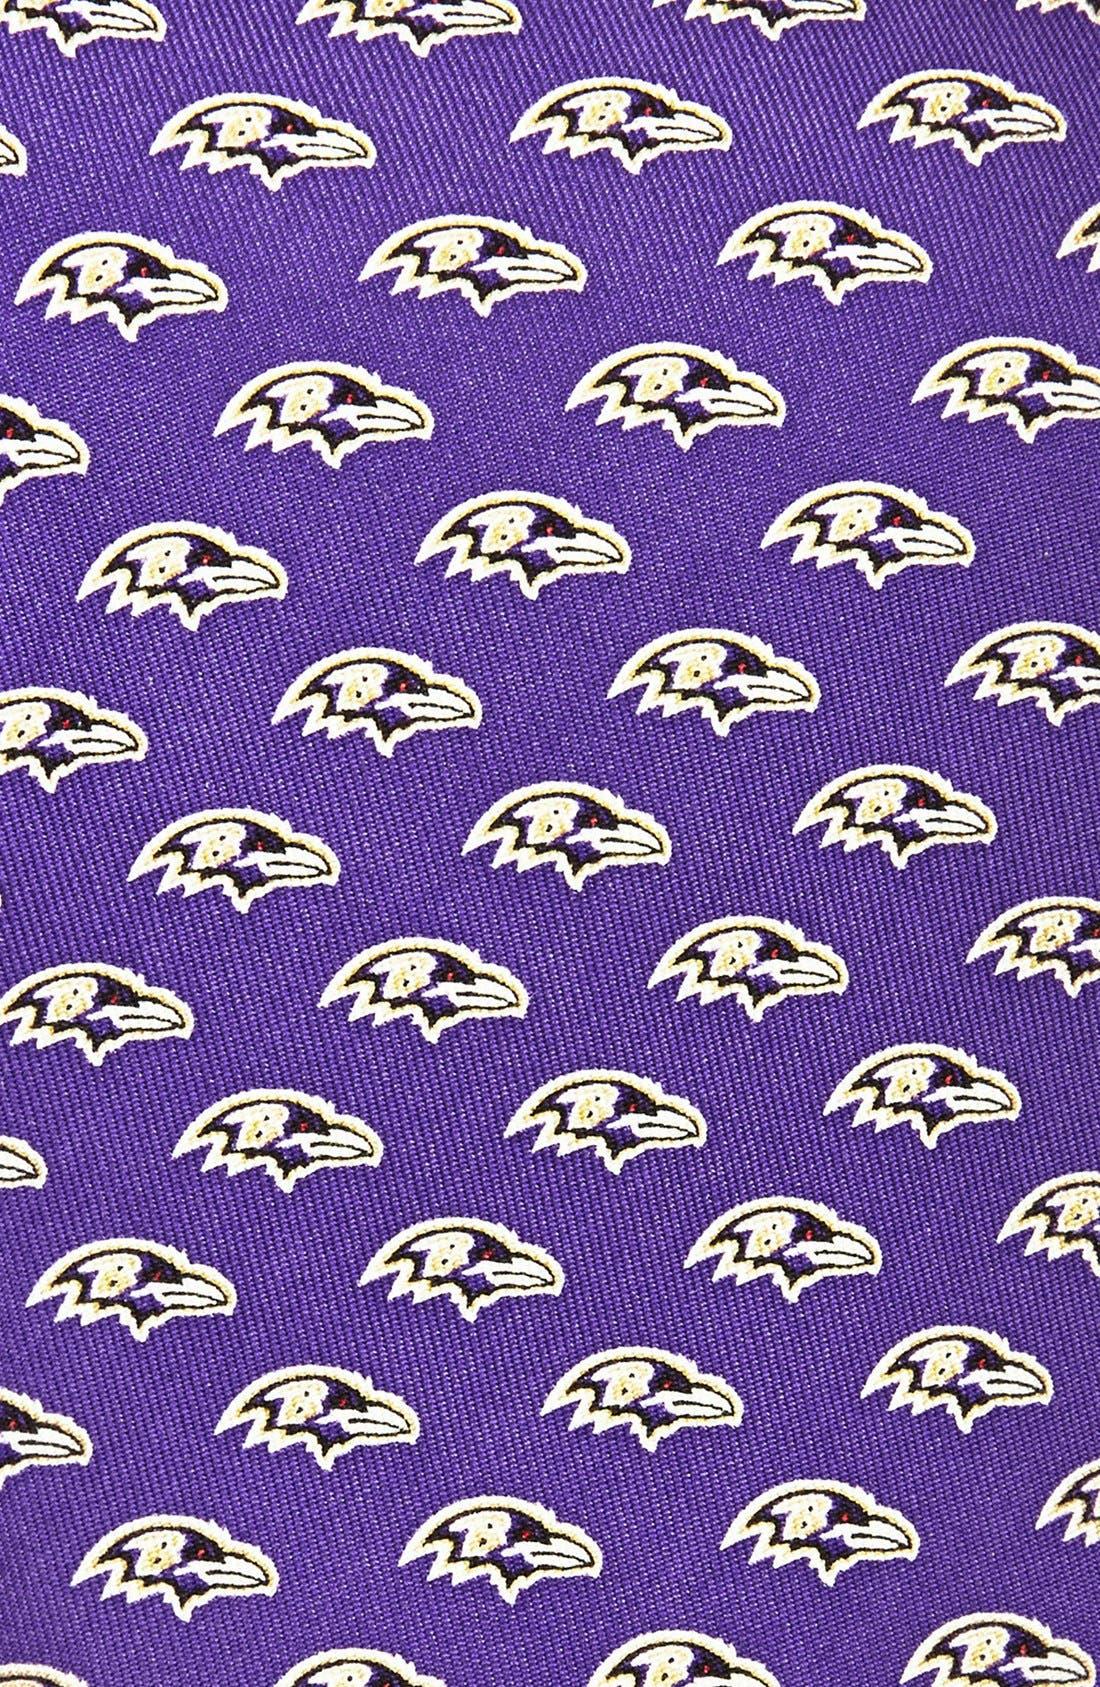 Baltimore Ravens - NFL Woven Silk Tie,                             Alternate thumbnail 2, color,                             525